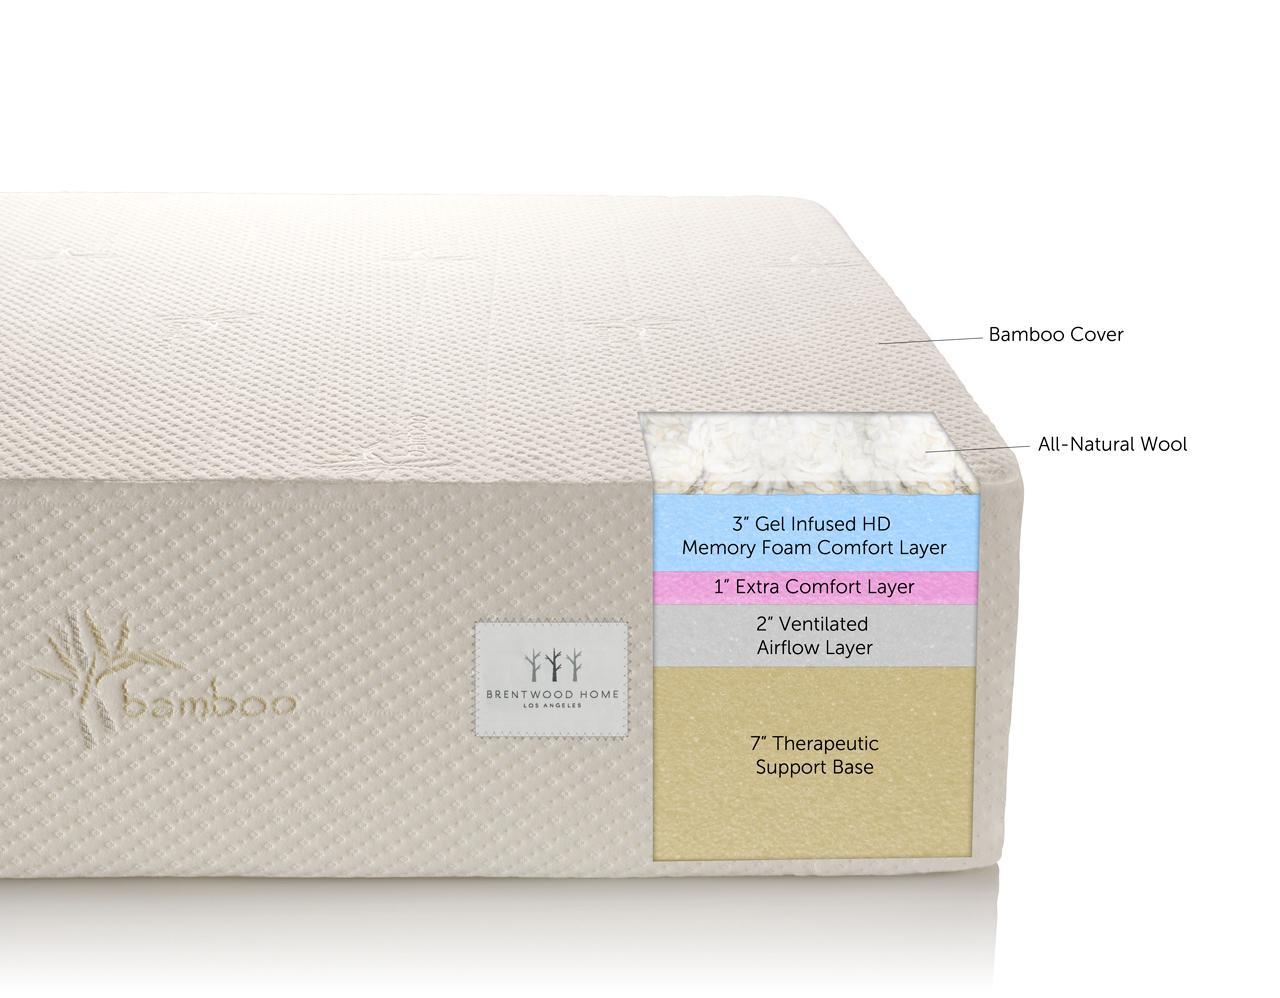 fourlayer technology brentwood home 13inch gel hd memory foam mattress review